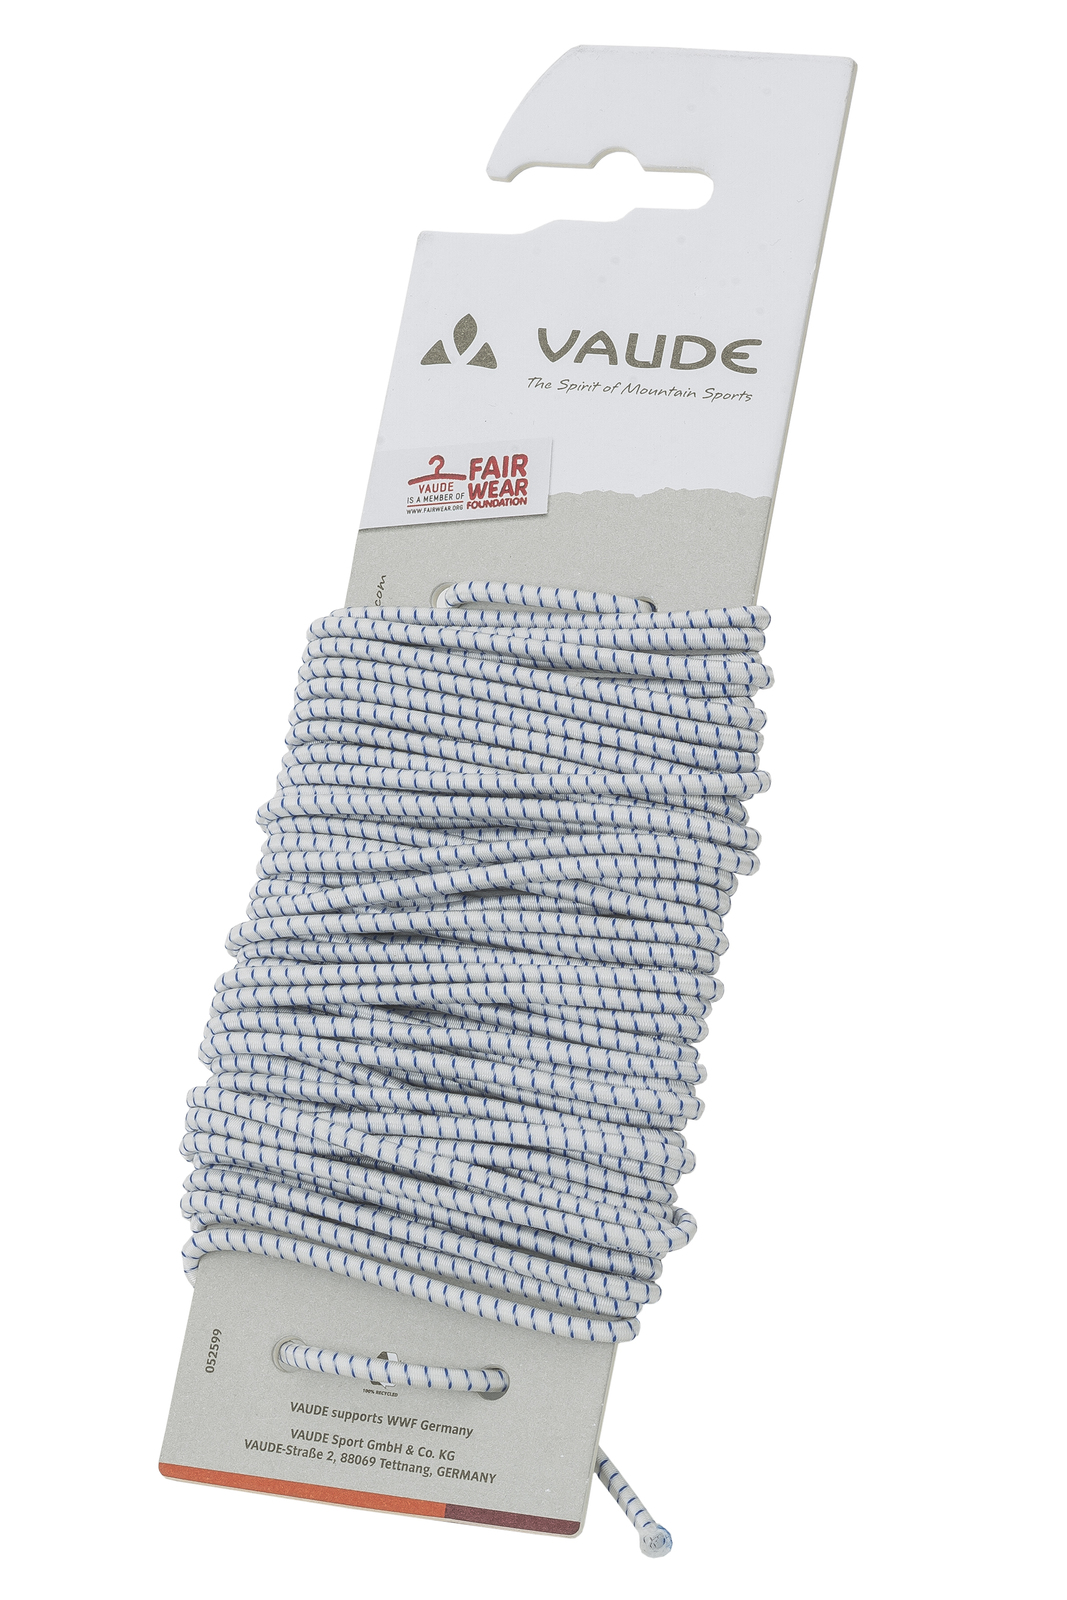 Vaude - Shock Cord (10 m) - Cord